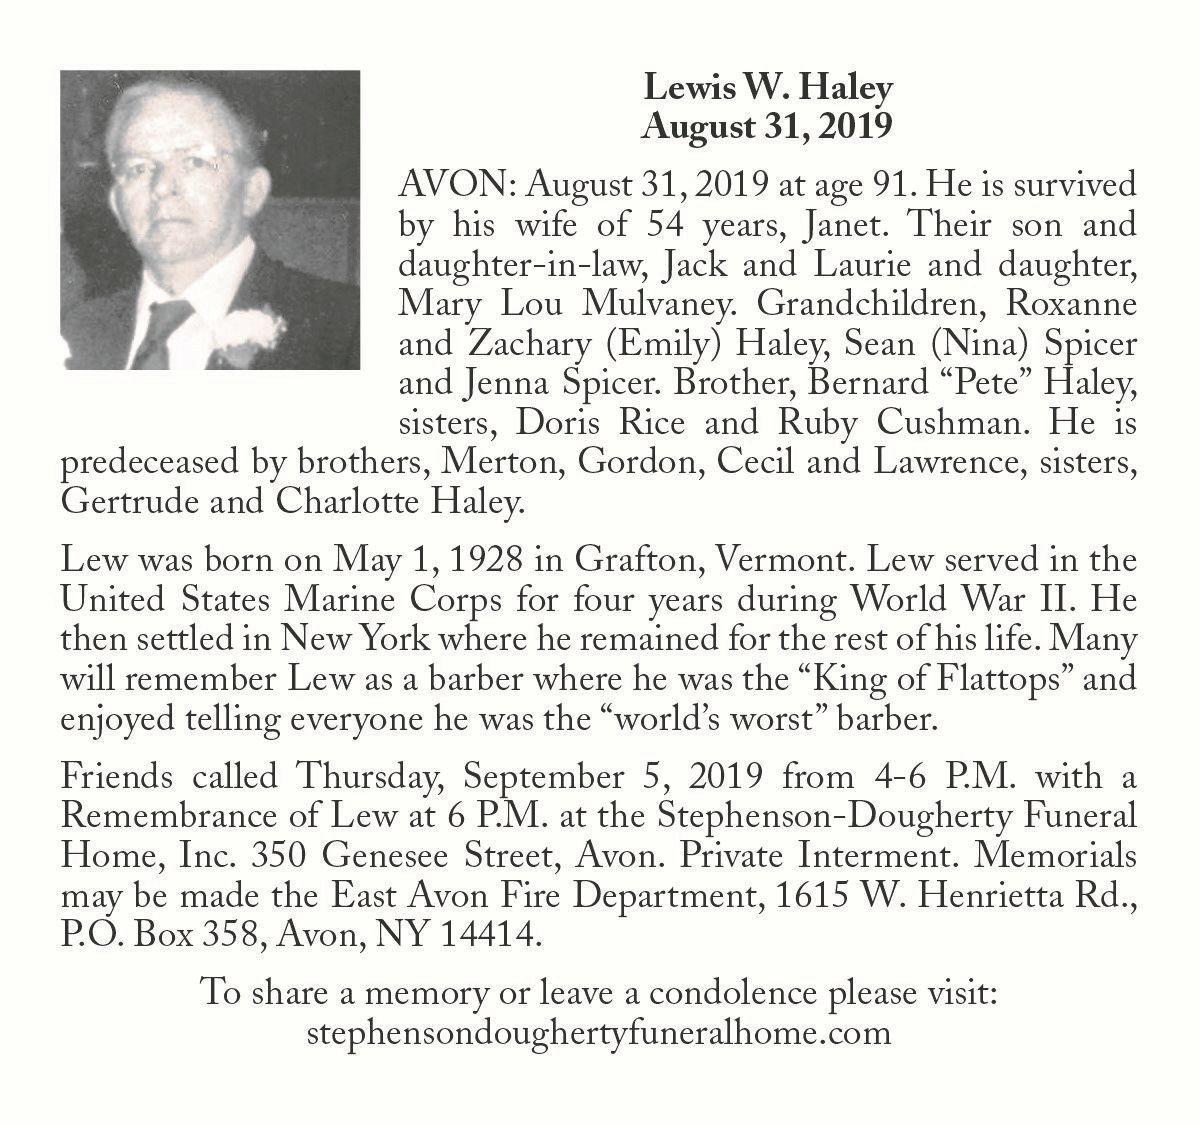 Lewis W. Haley ~ August 31, 2019